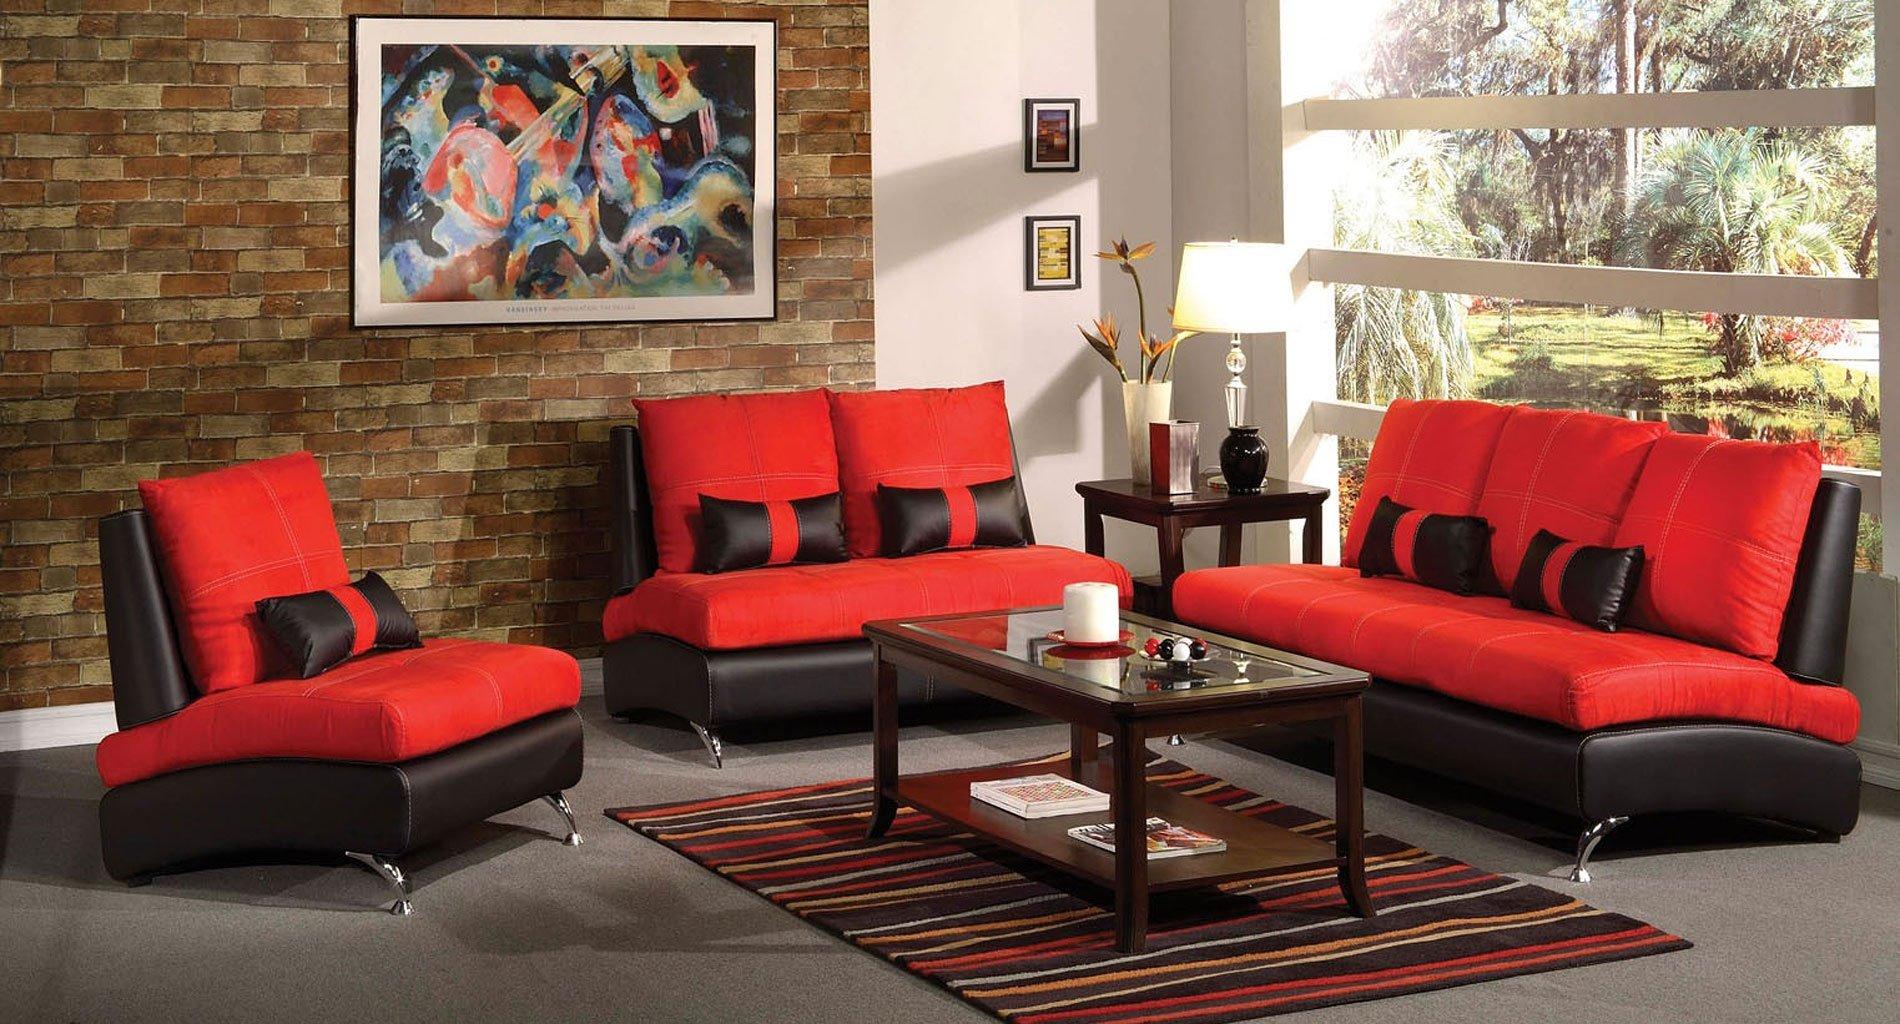 Jolie Living Room Set (Red and Black)